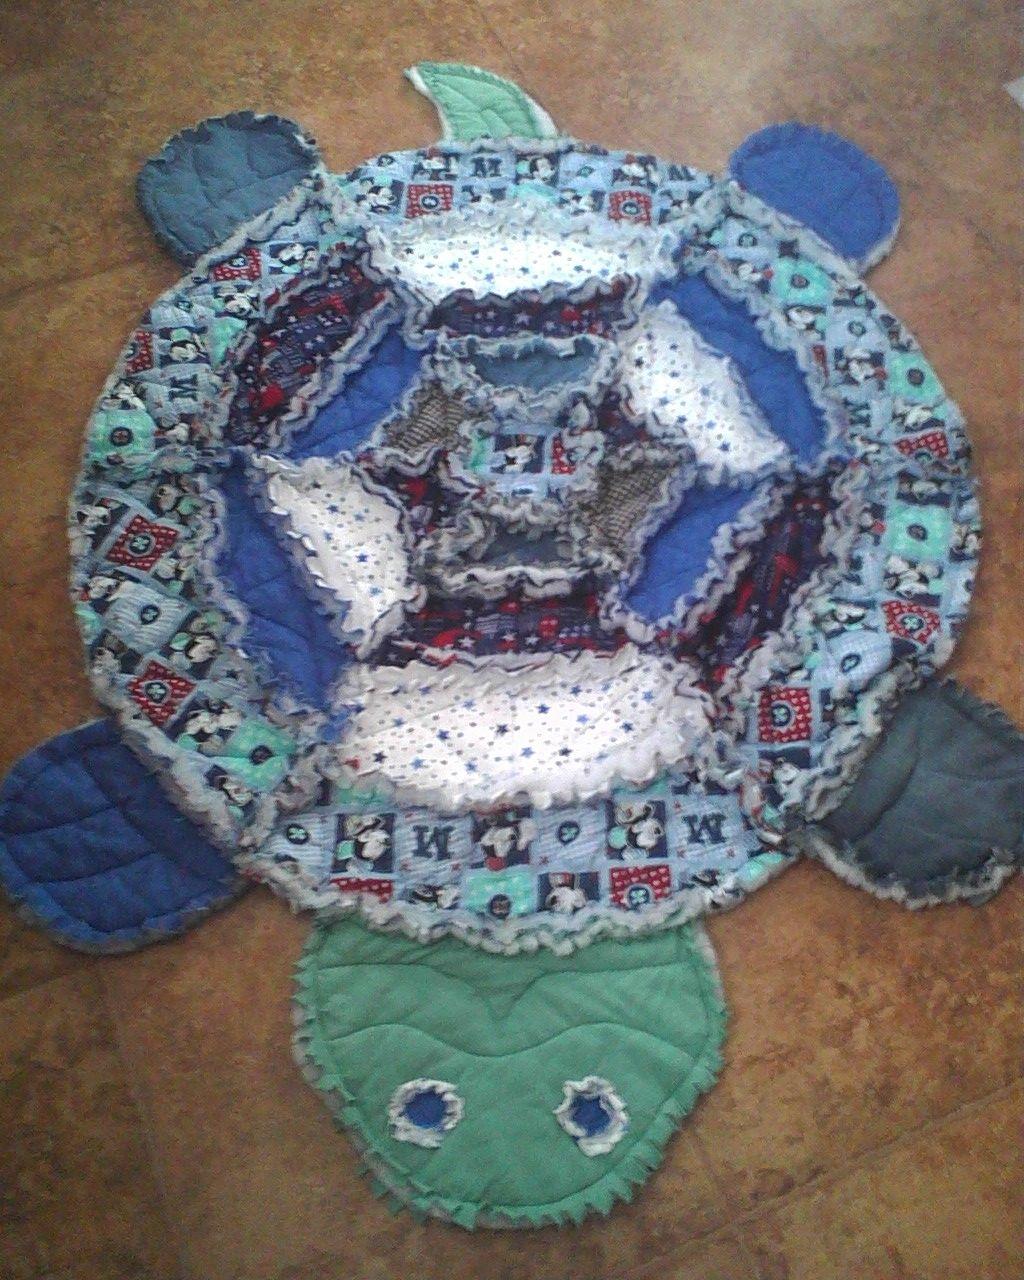 Simplicity 2493 -Turtle Rag Quilt | Crafting | Pinterest | Rag ... : turtle rag quilt - Adamdwight.com